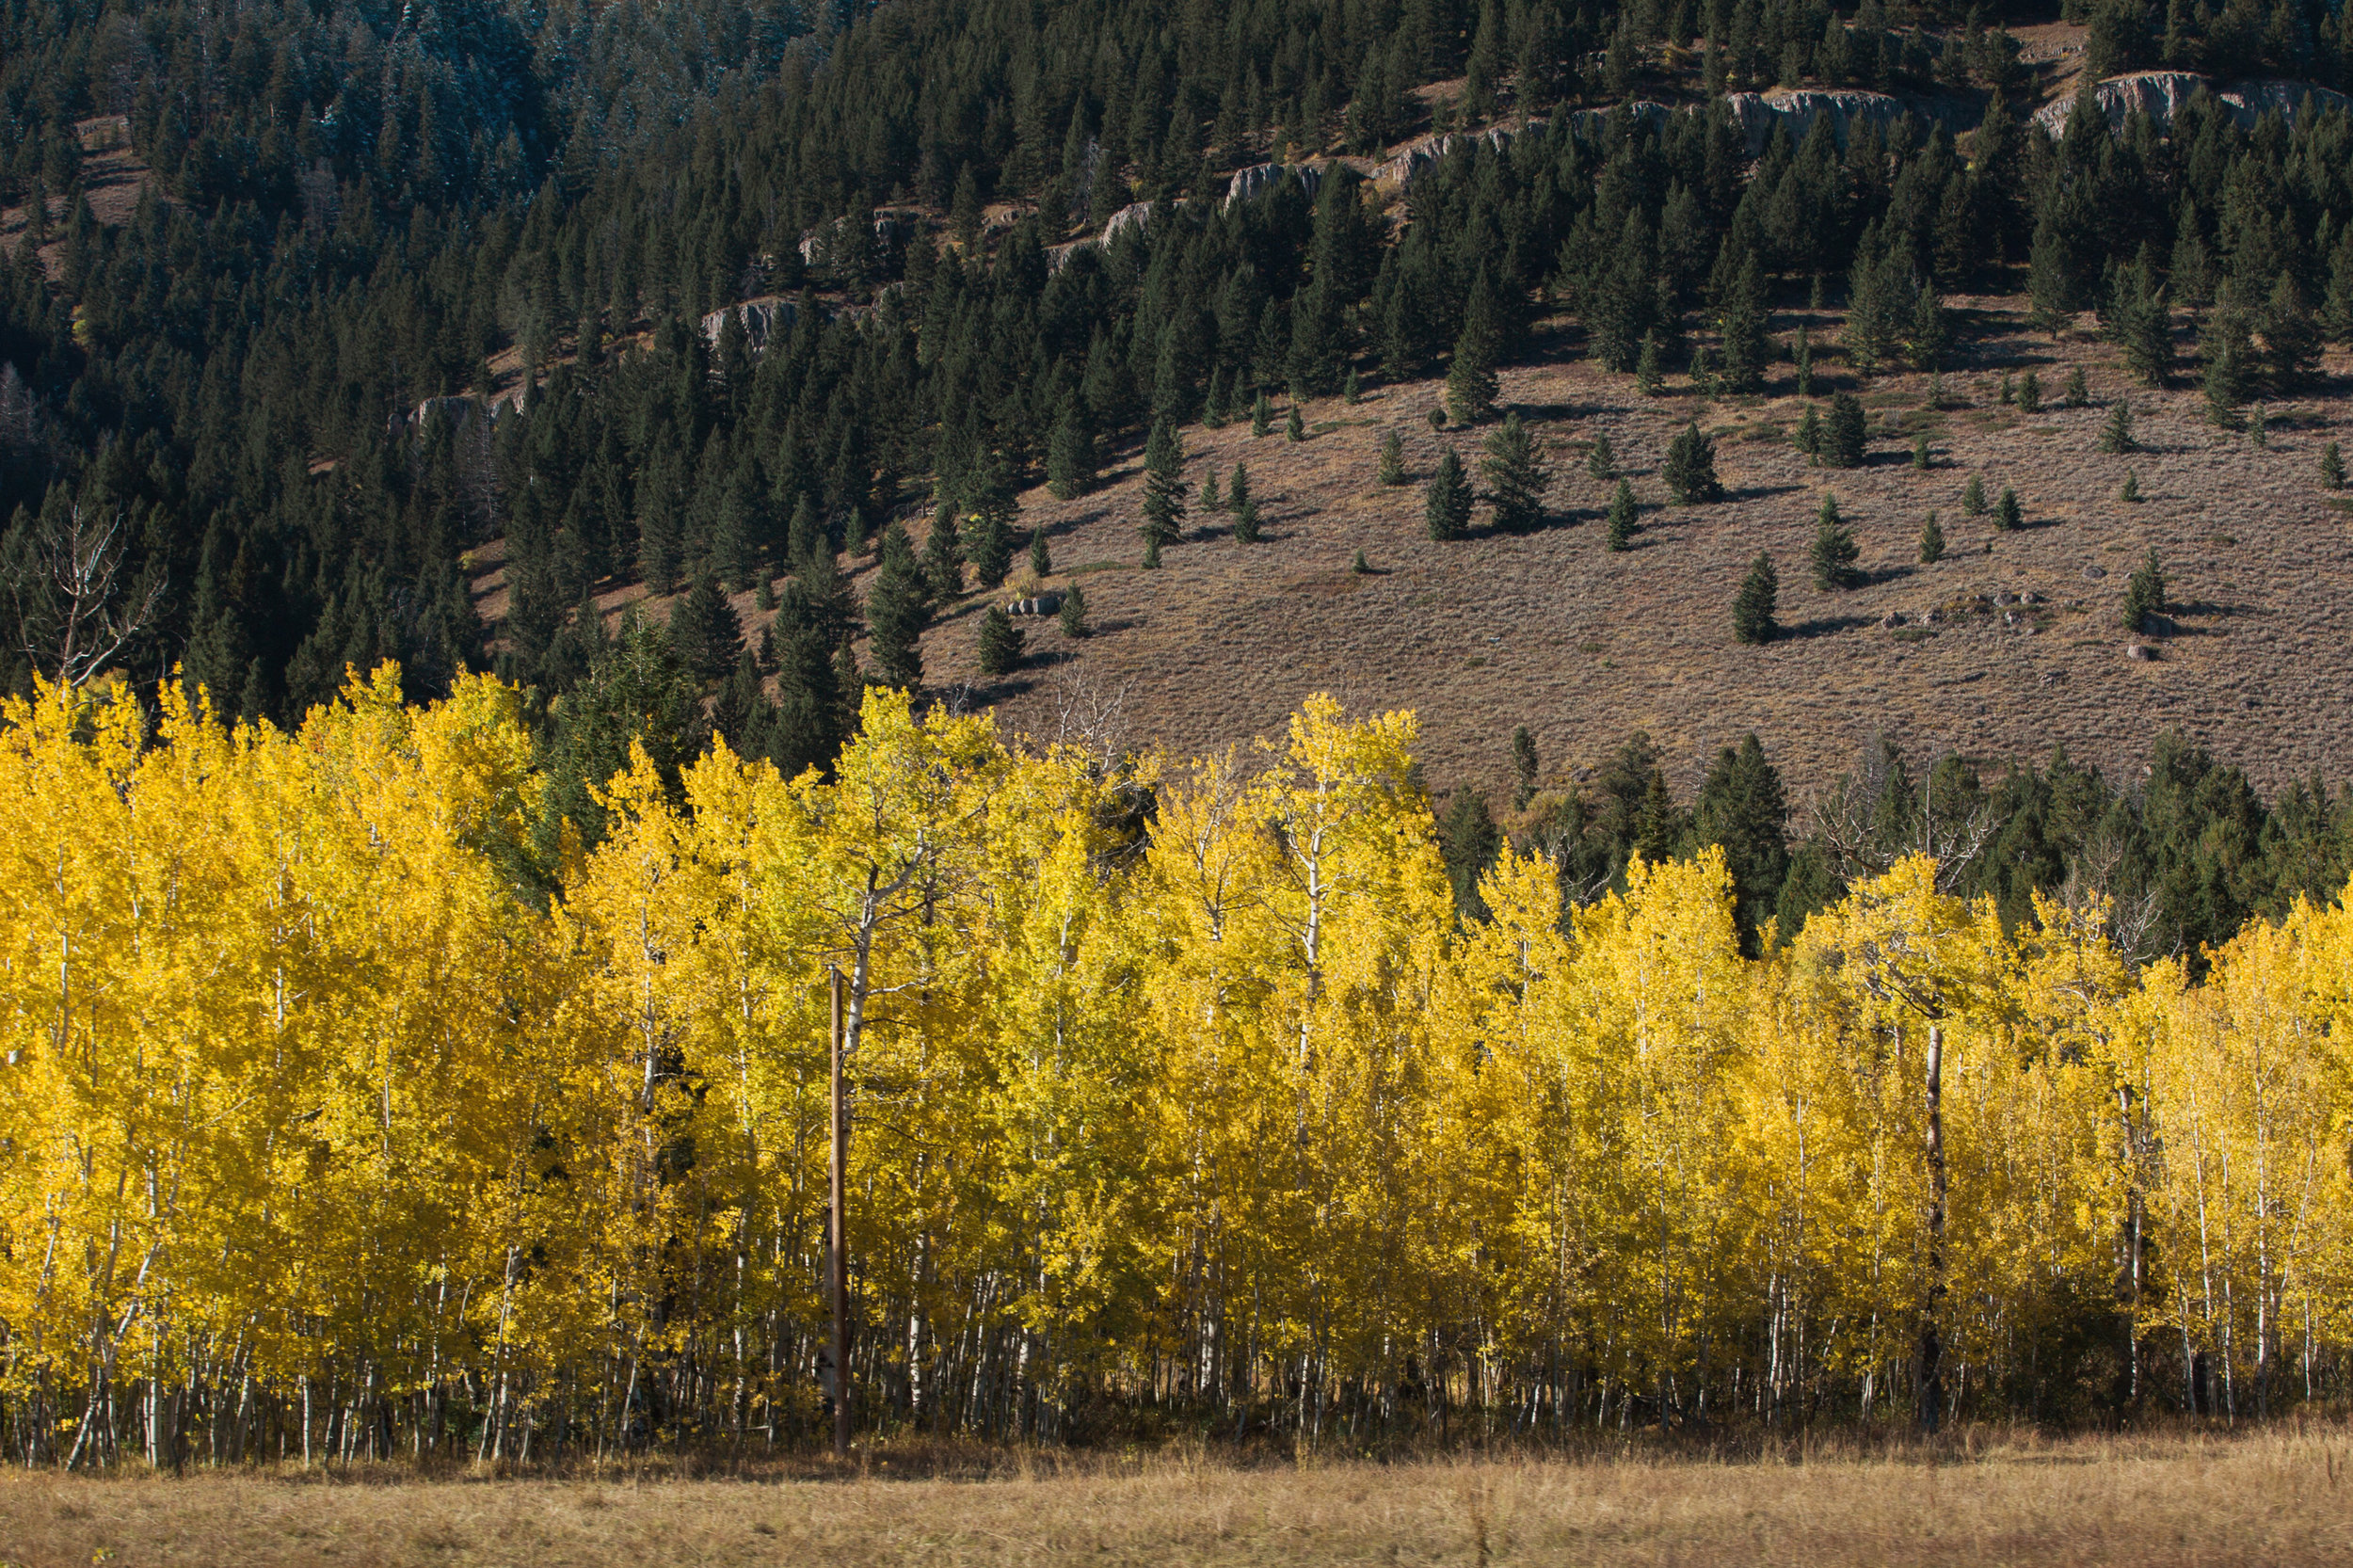 Cindy_Giovagnoli_Idaho_Wyoming_Grand_Teton_National_Park_autumn_aspens_camping_mountains-021.jpg